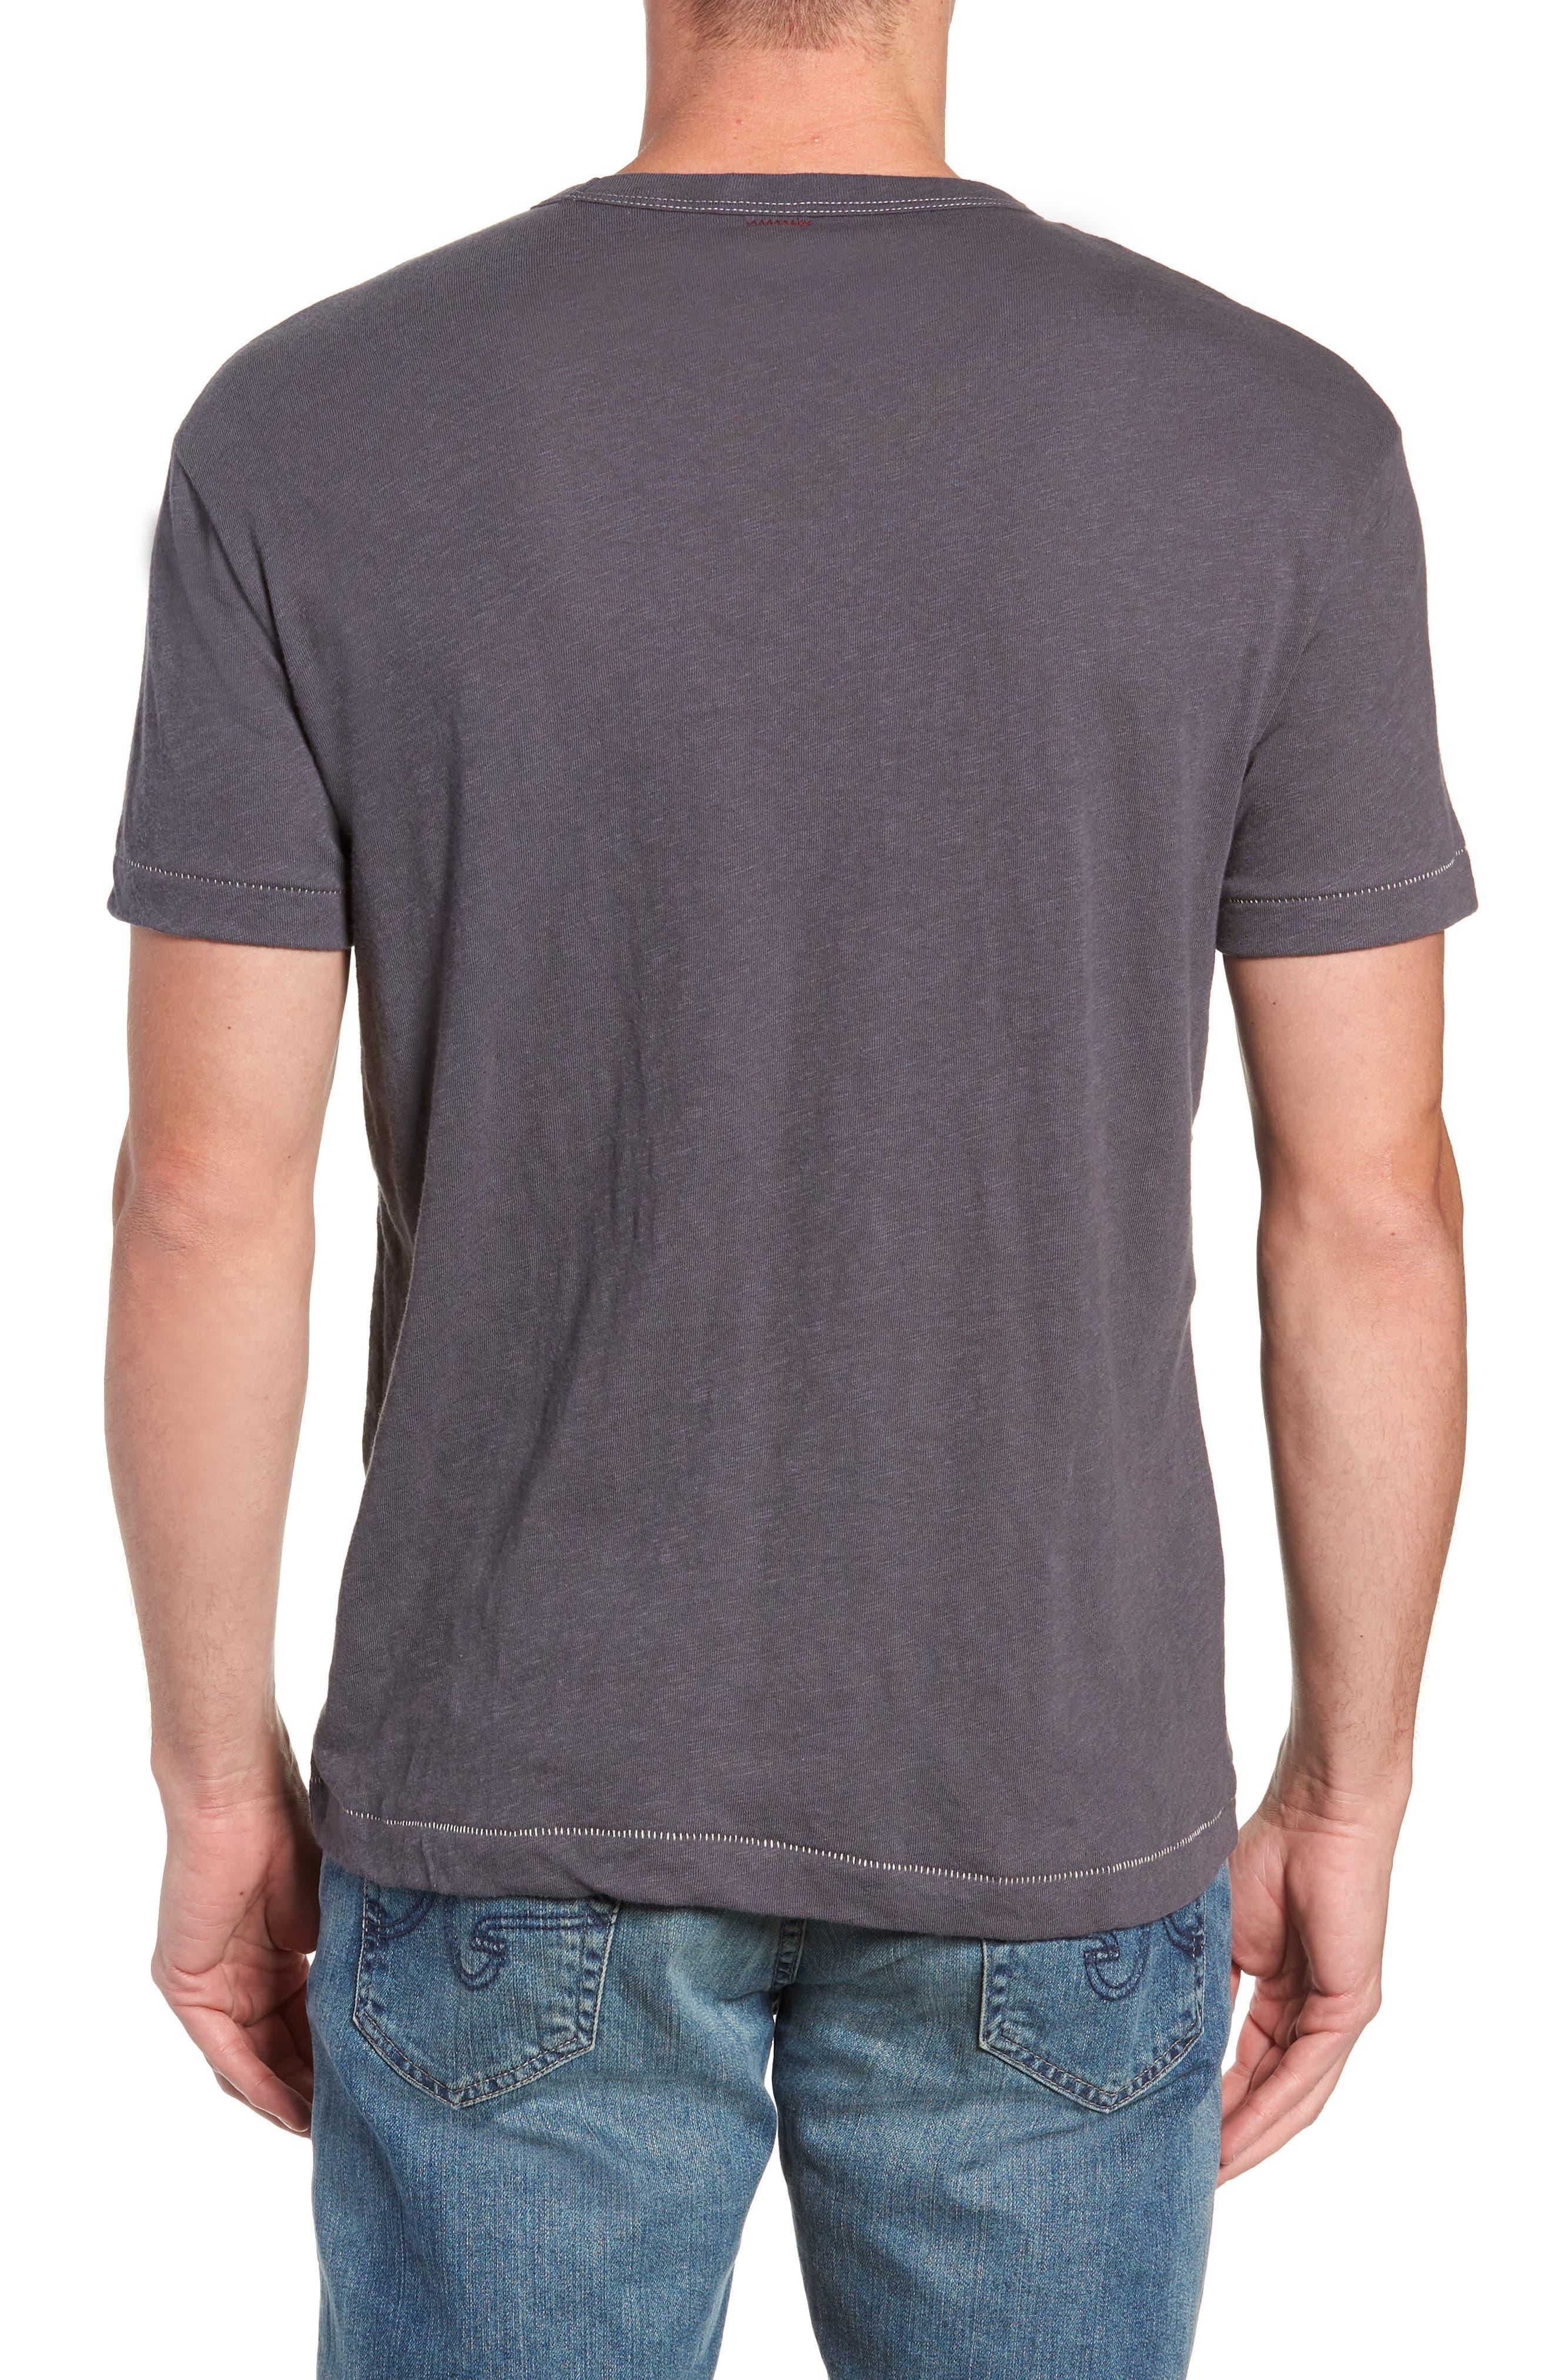 TODD SNYDER,                             + Champion Crewneck T-Shirt,                             Alternate thumbnail 2, color,                             060